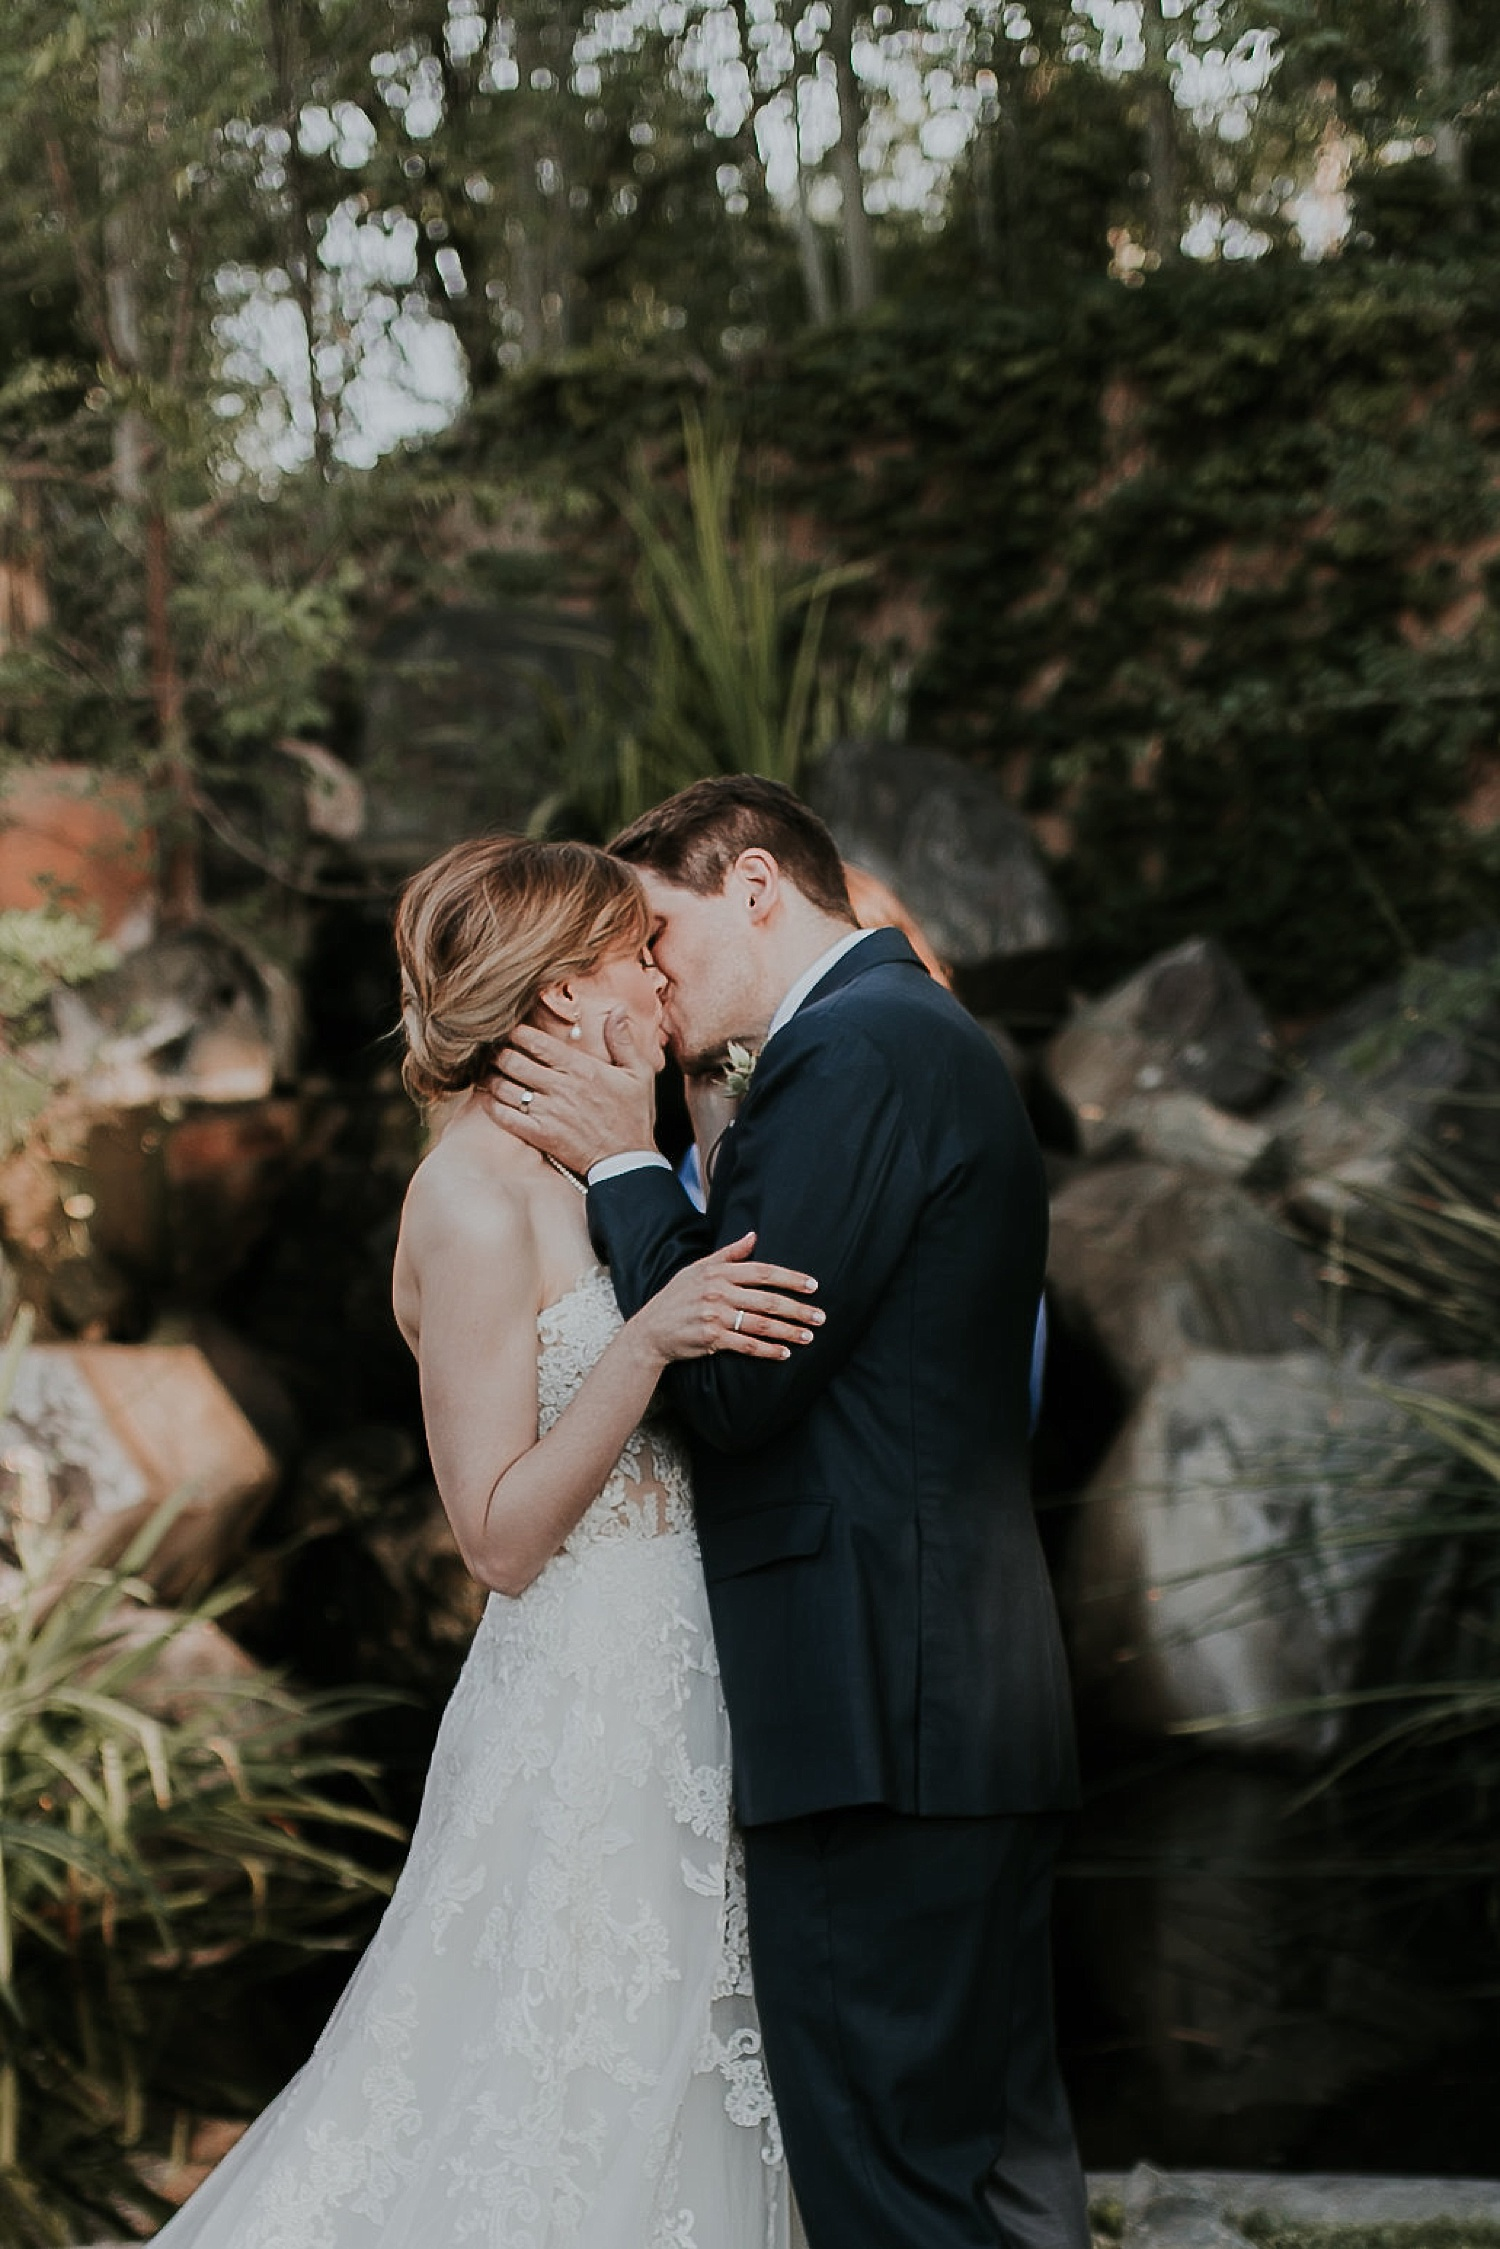 Alicia+lucia+photography+-+albuquerque+wedding+photographer+-+santa+fe+wedding+photography+-+new+mexico+wedding+photographer+-+gerald+peters+gallery+wedding_0047.jpg